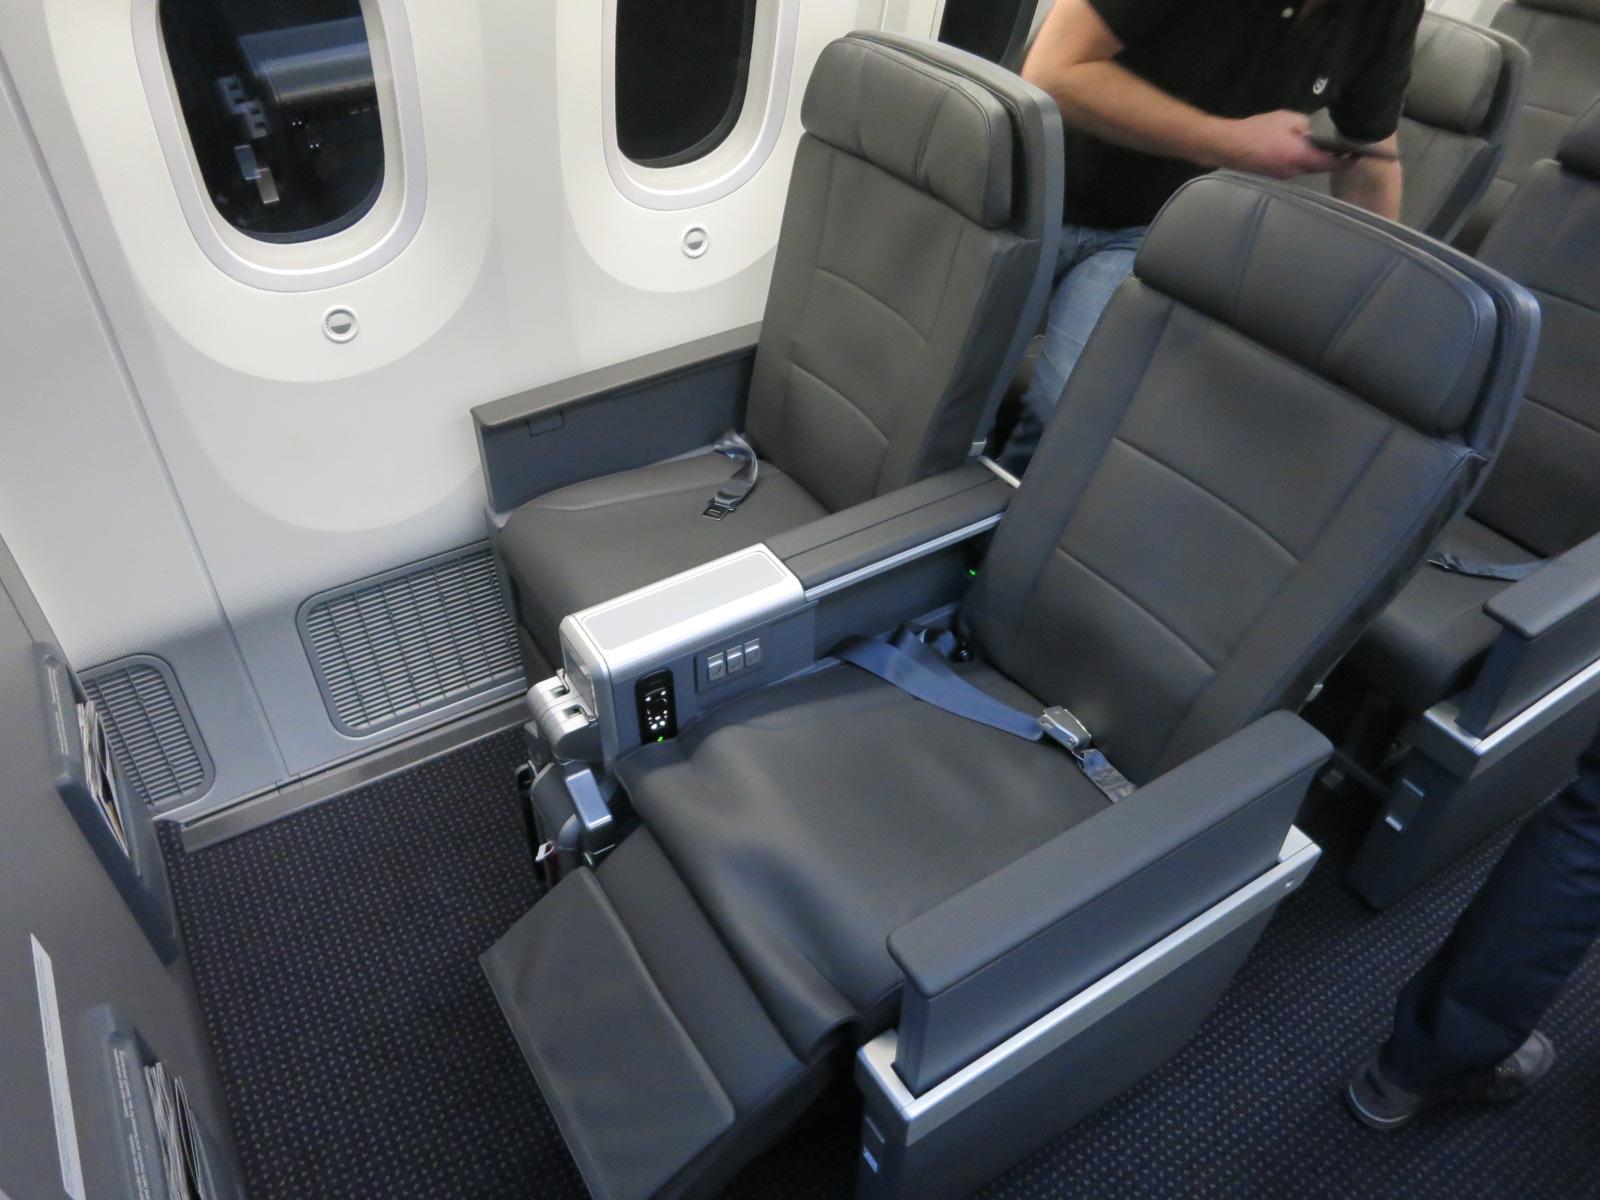 British Airways Premium Economy Seats Review